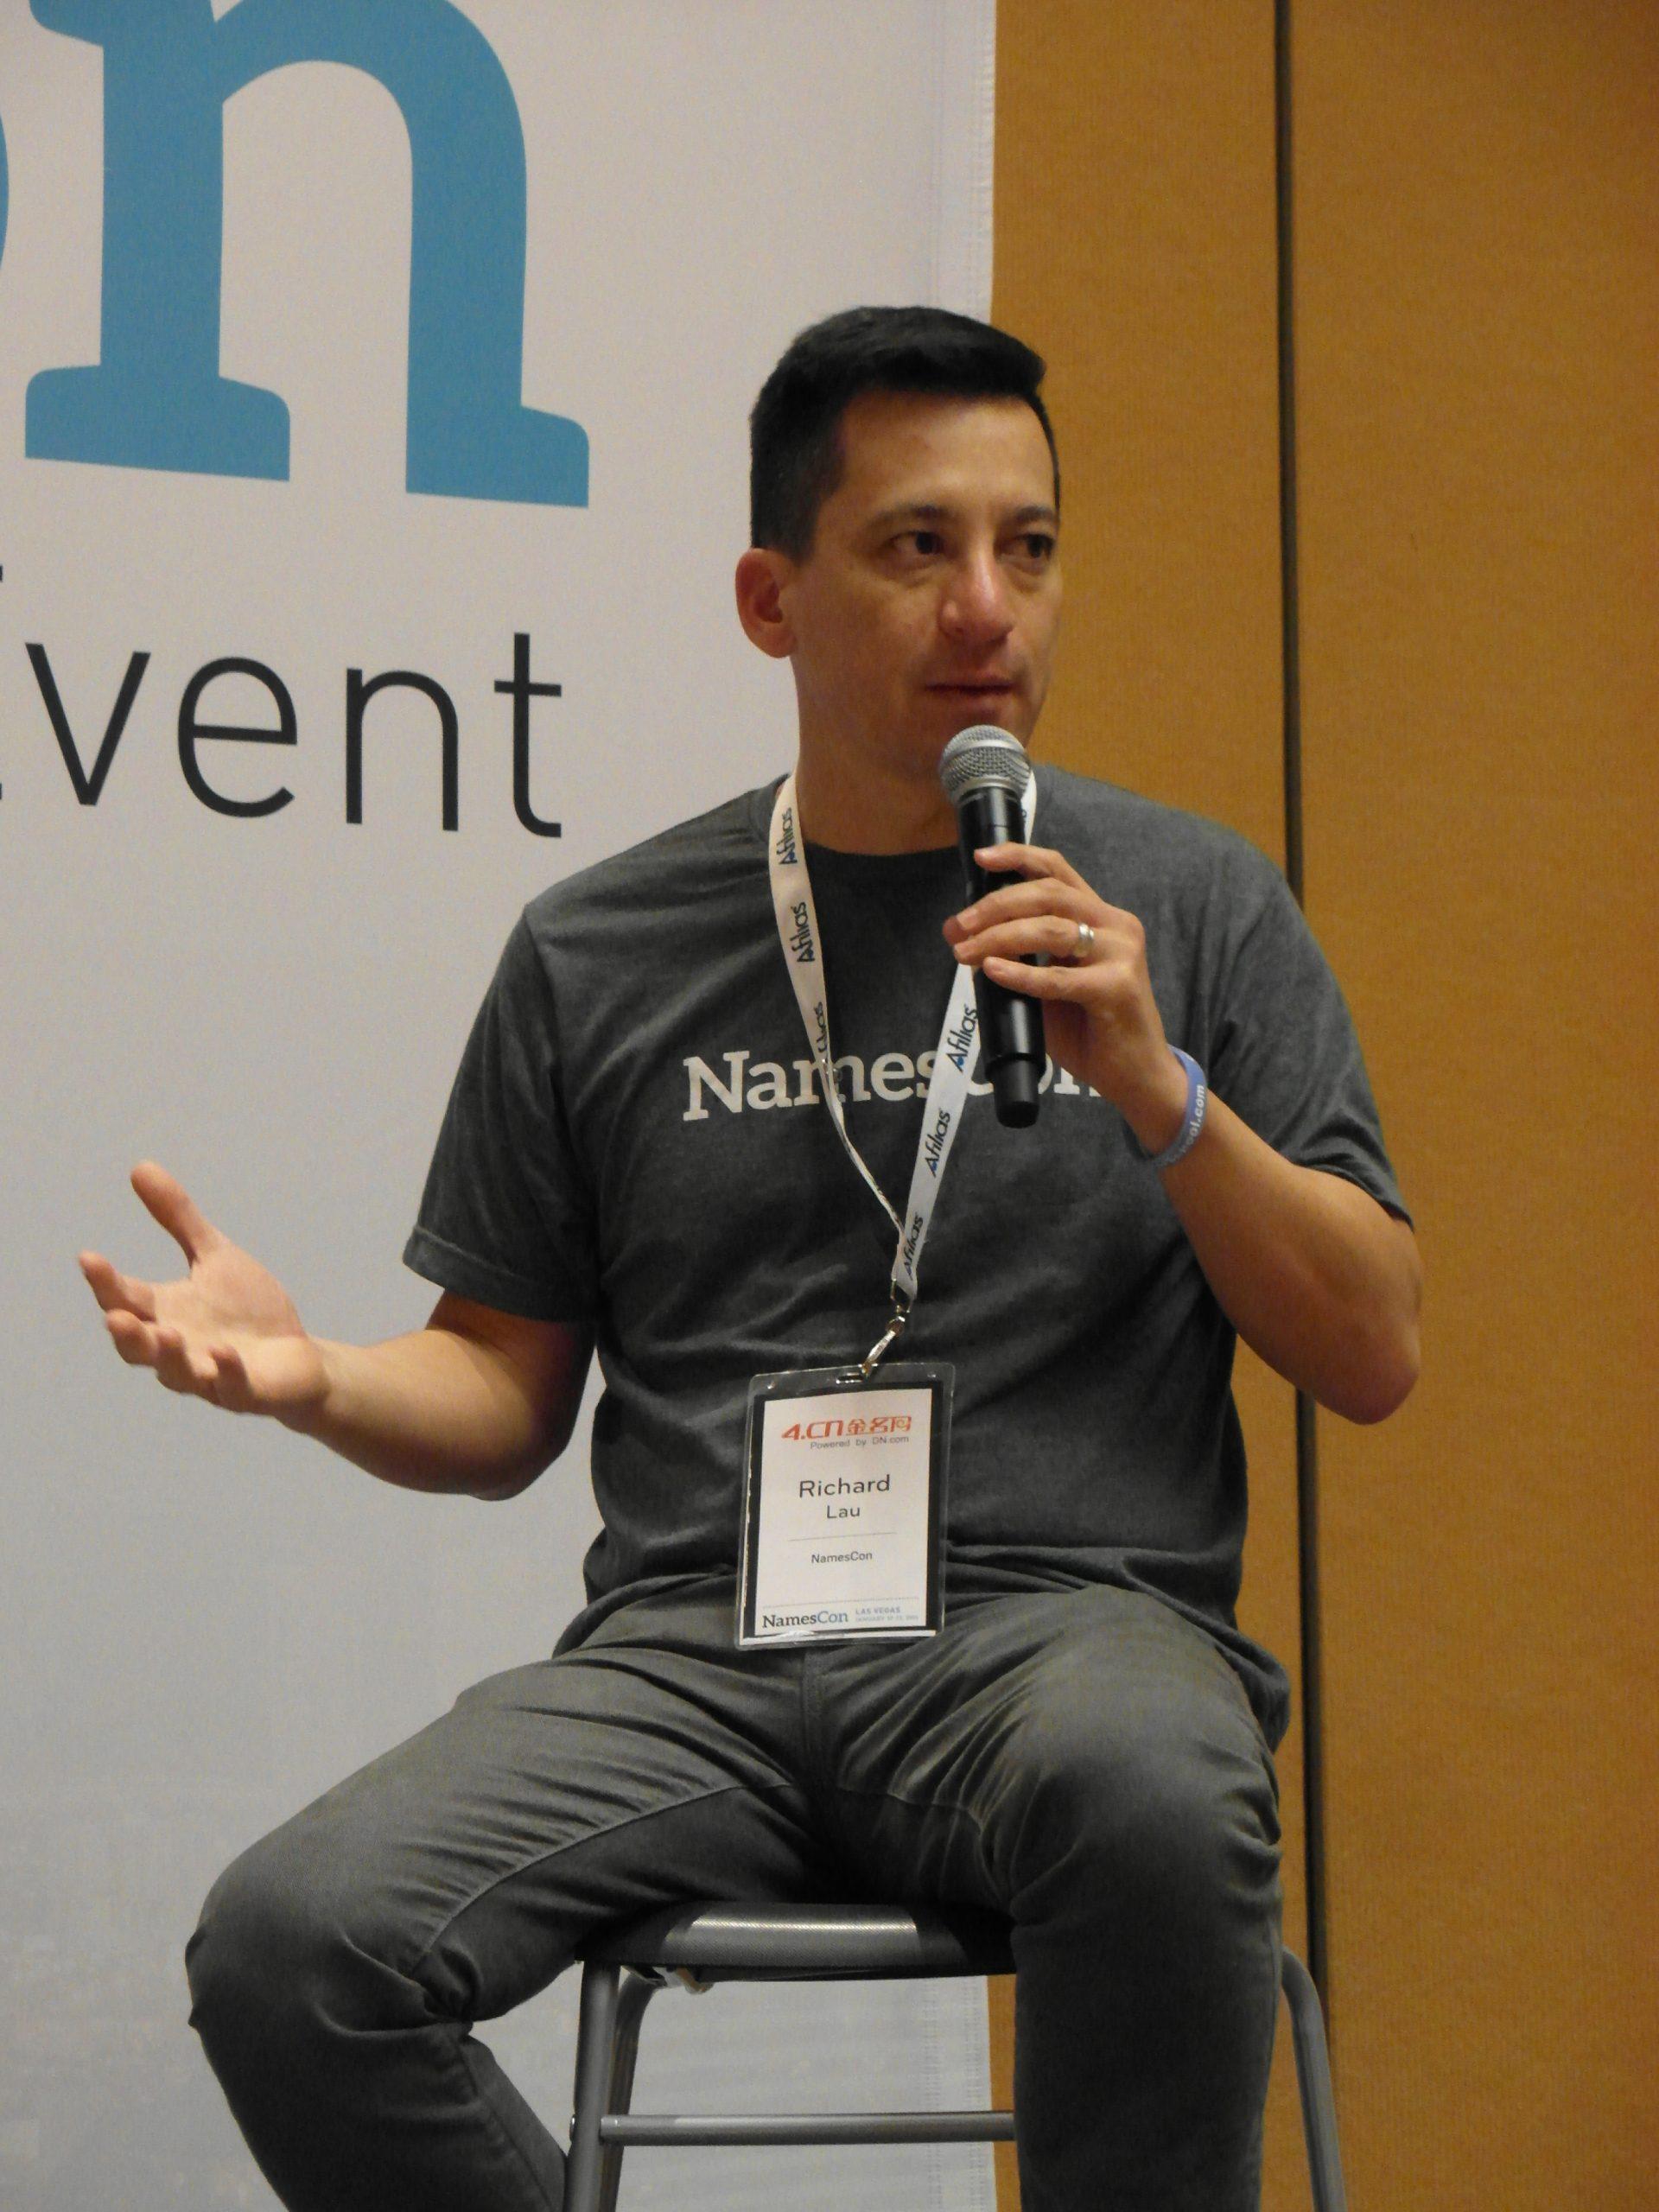 Richard Lau - FutureProofing Your Domain Business